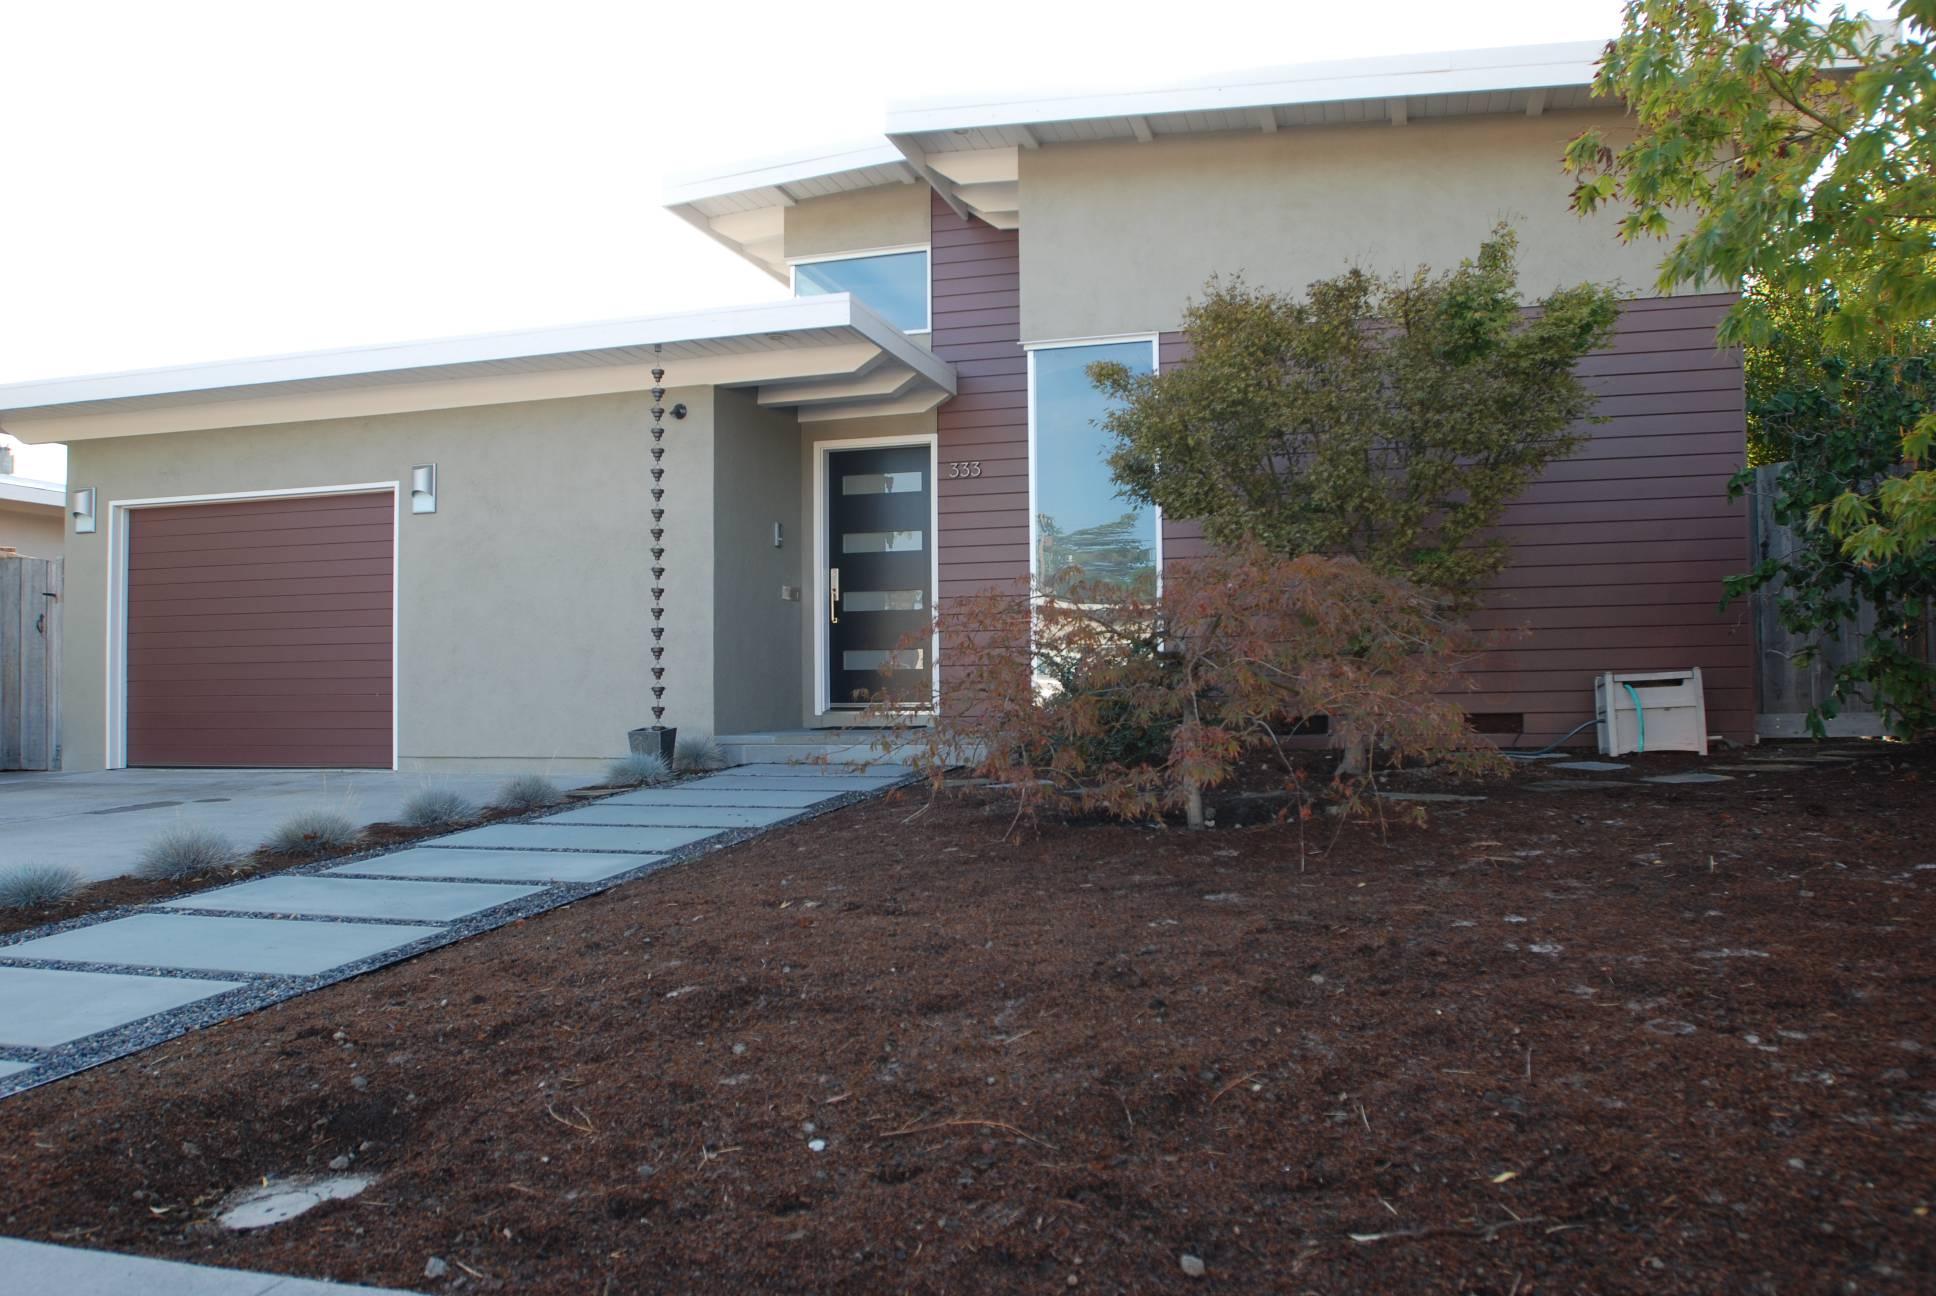 Modern home front yard facade, Architect design, exterior design work, Mountain View